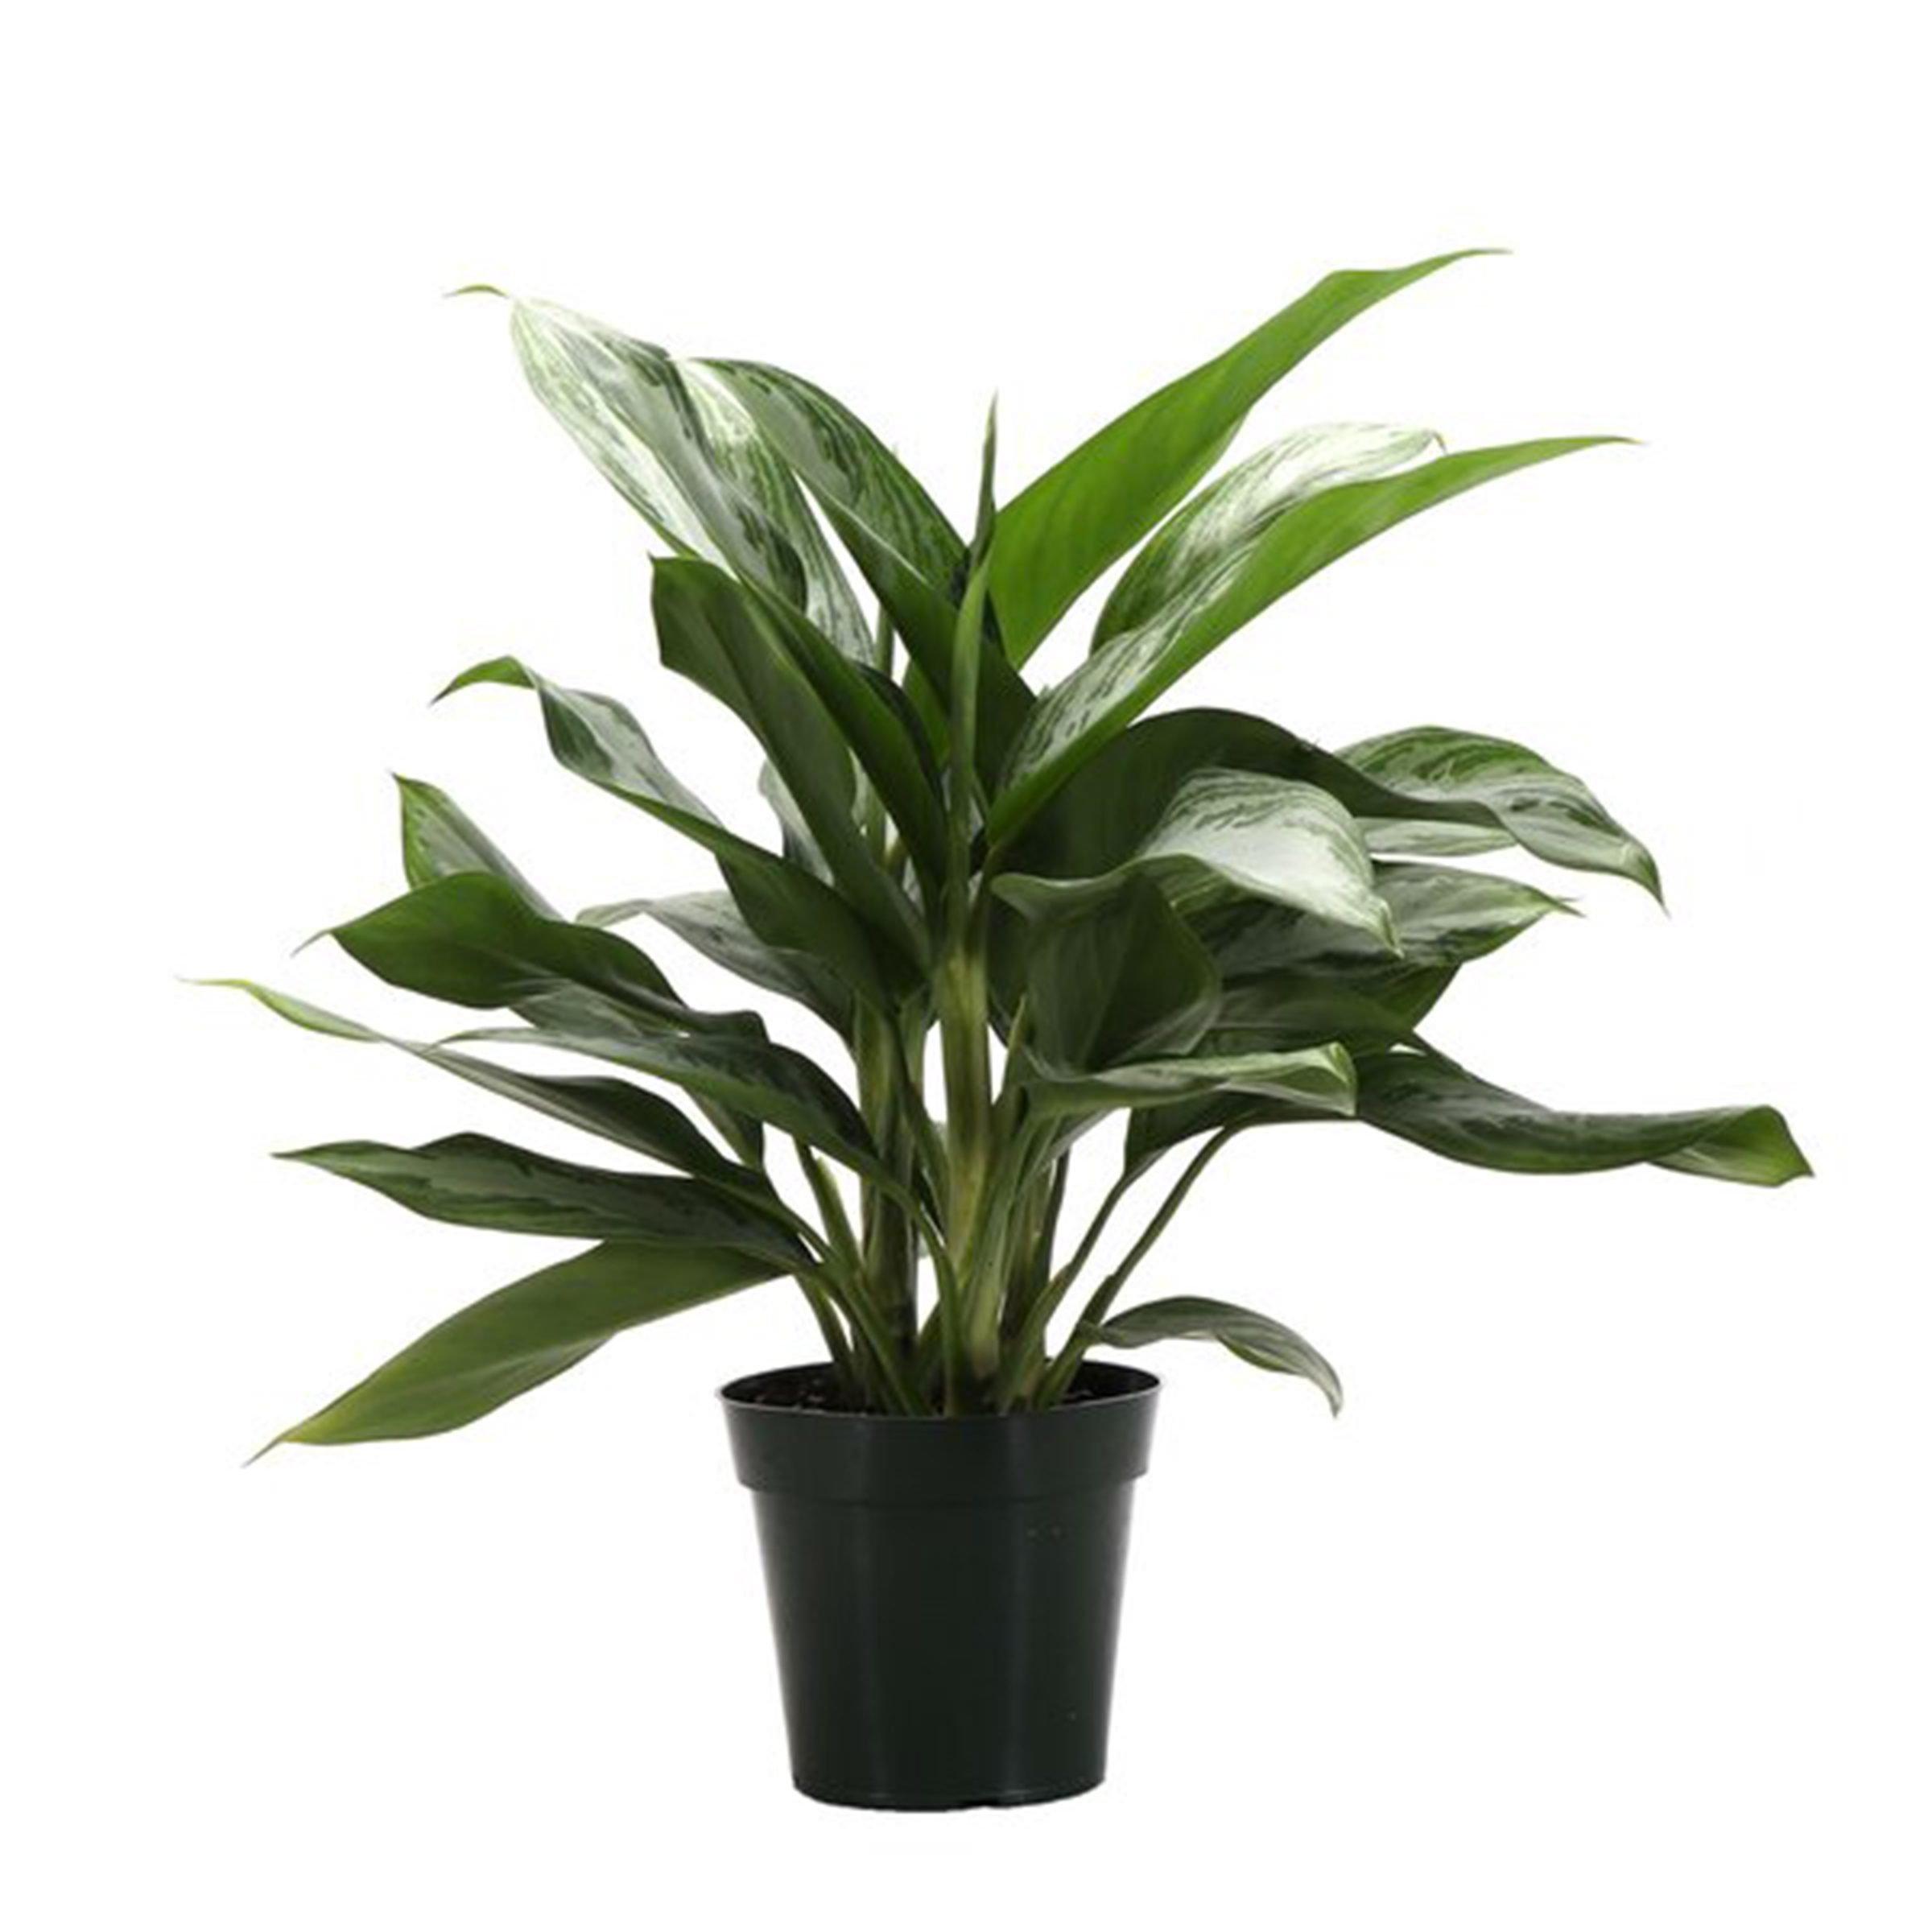 Silver Queen plant